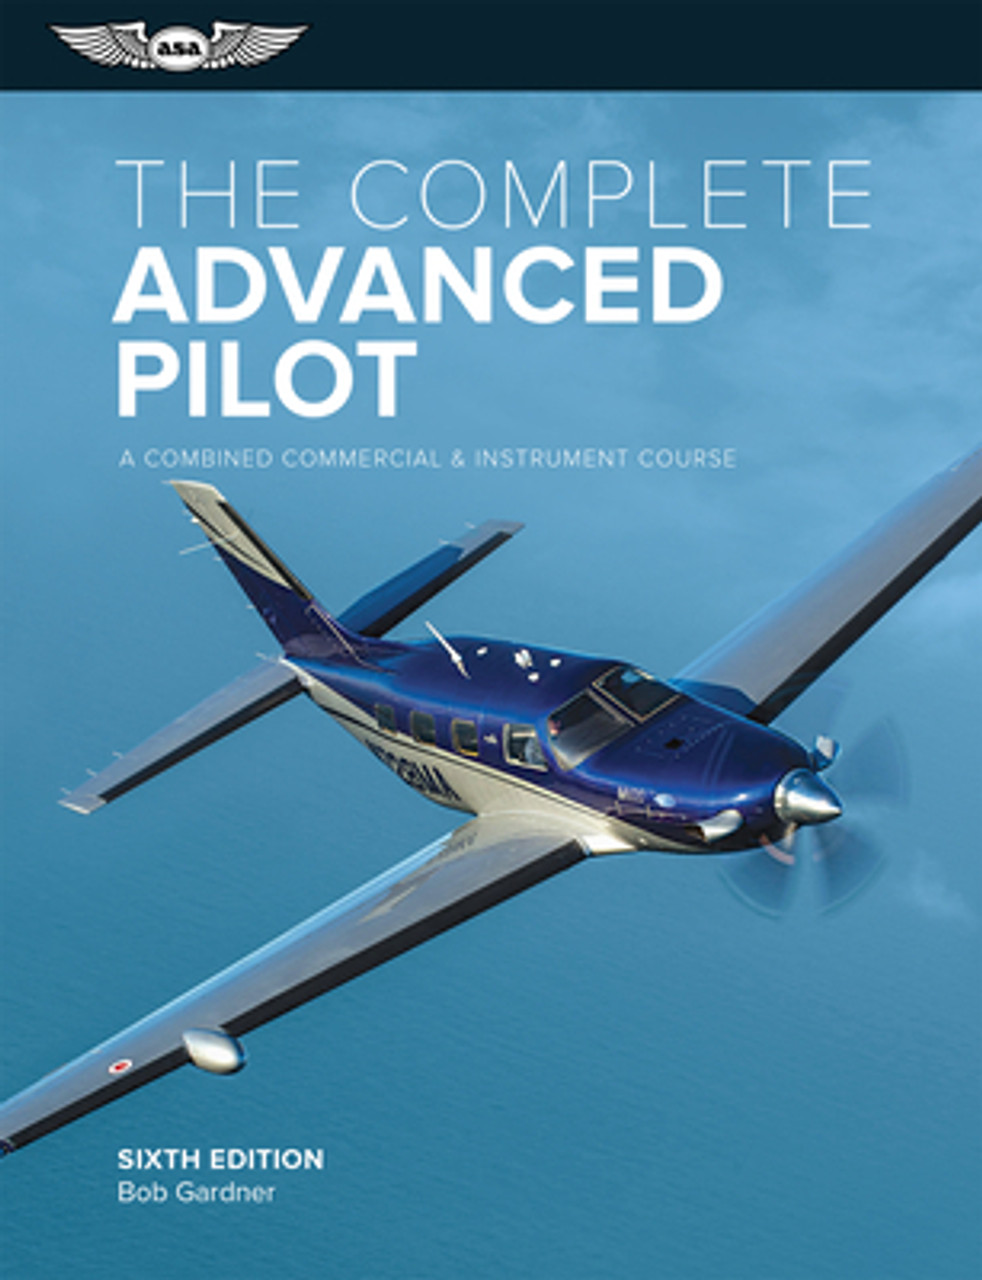 ASA: The Complete Advanced Pilot